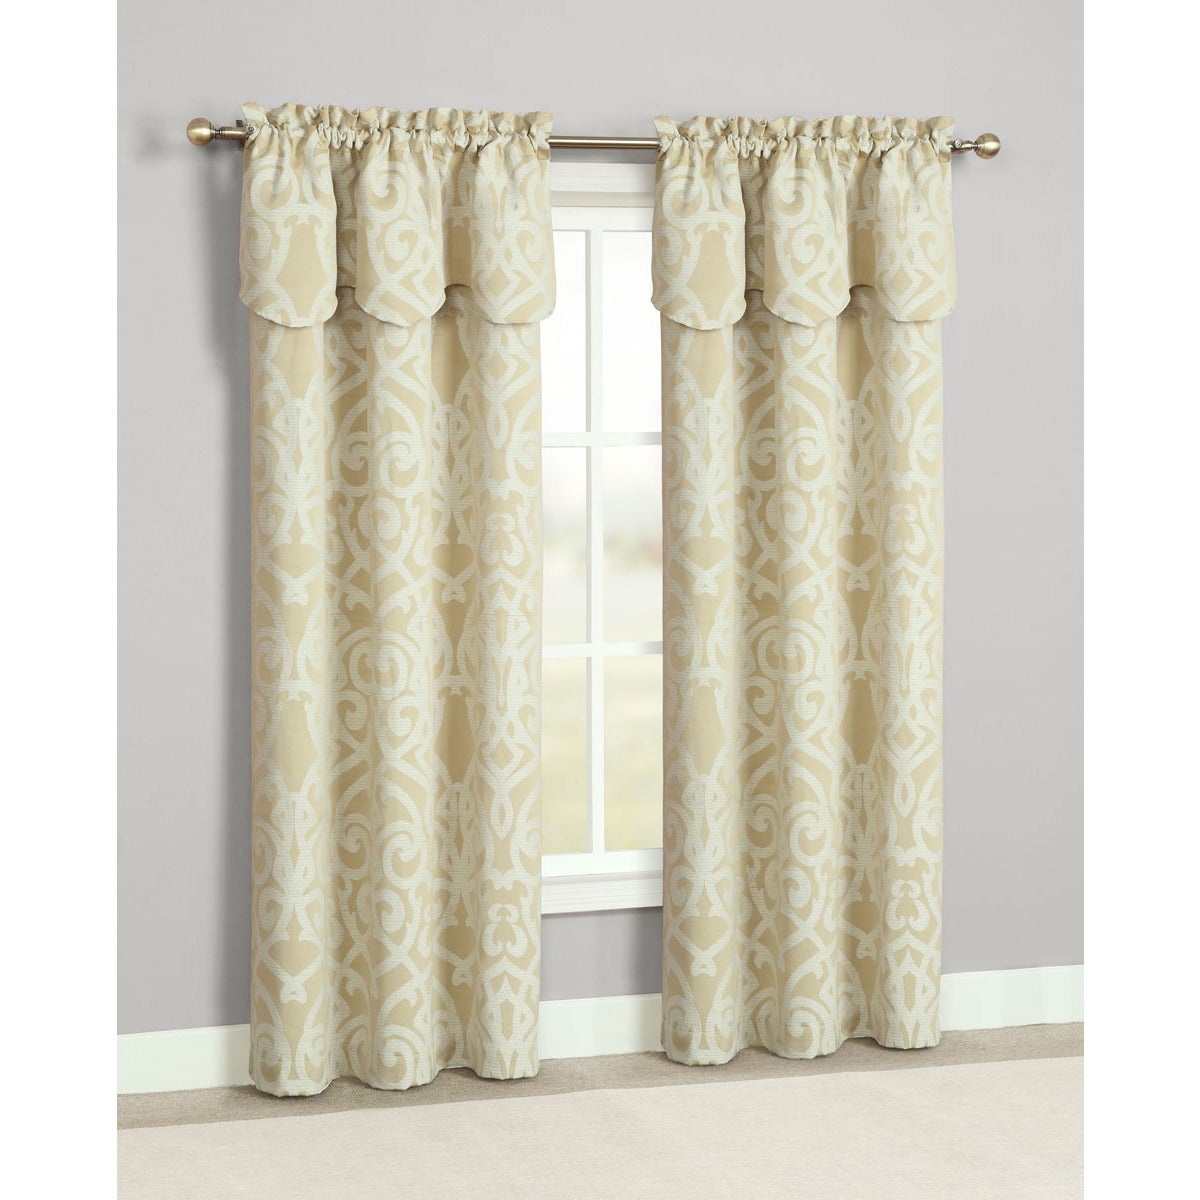 Overstock.com Pennington Rod Pocket Curtain Panels